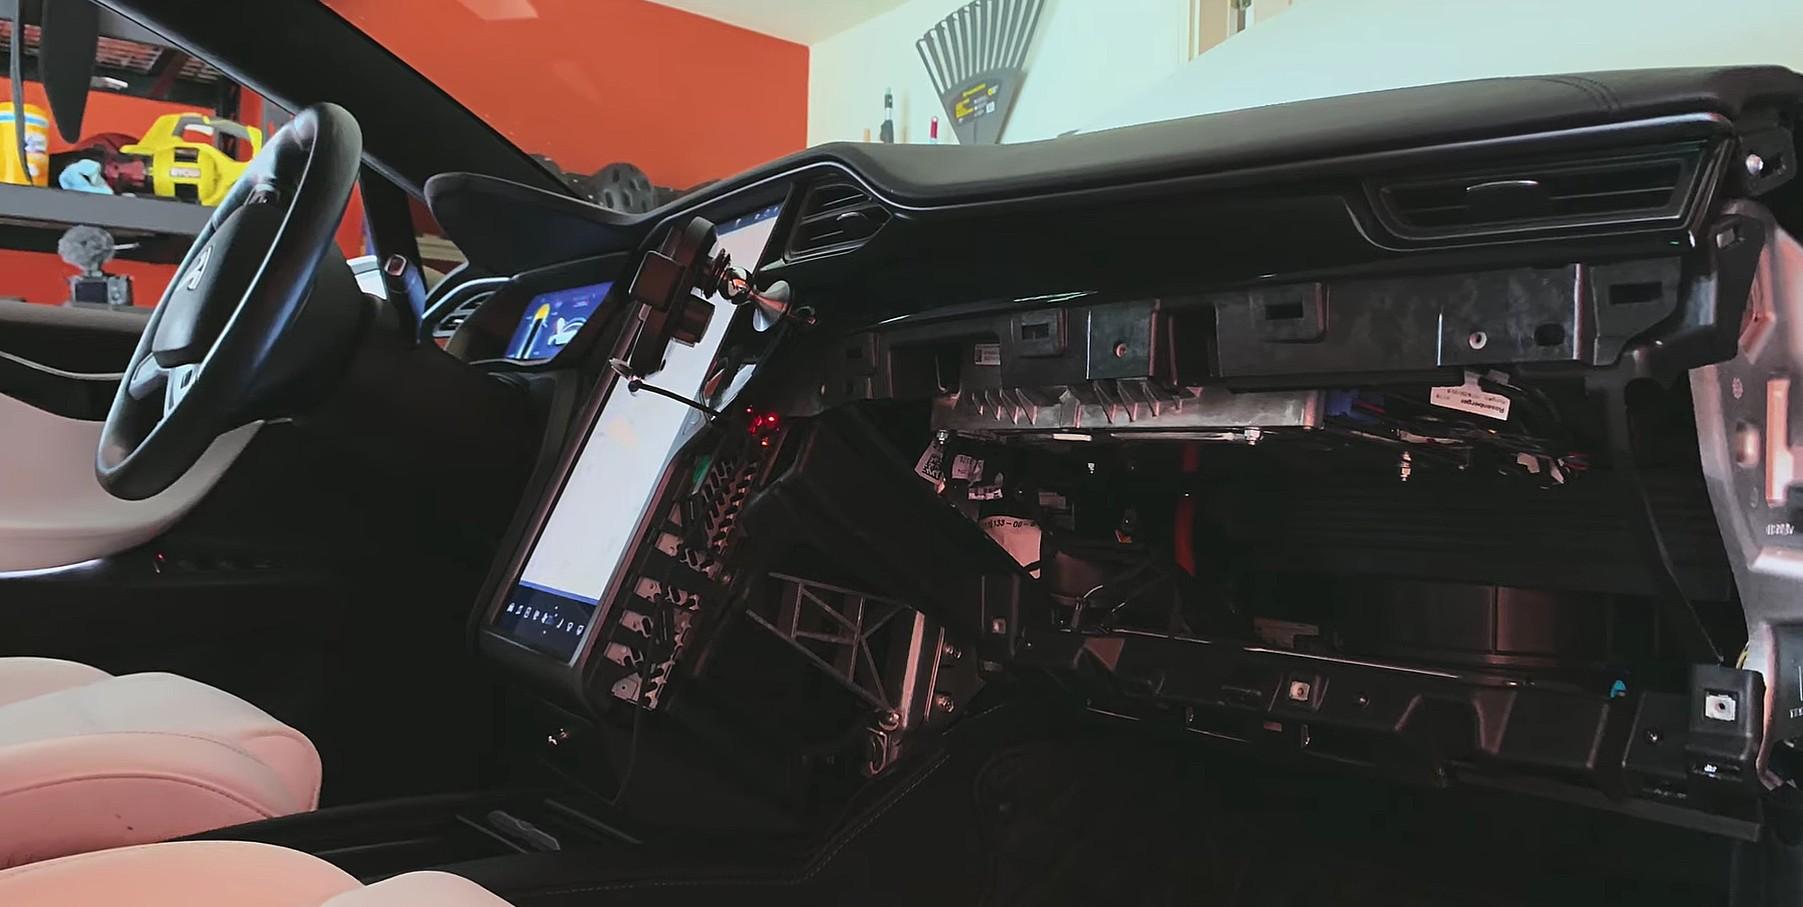 Стоимость модернизации Tesla FSD Hardware 3.0 снижена до 1000 долларов